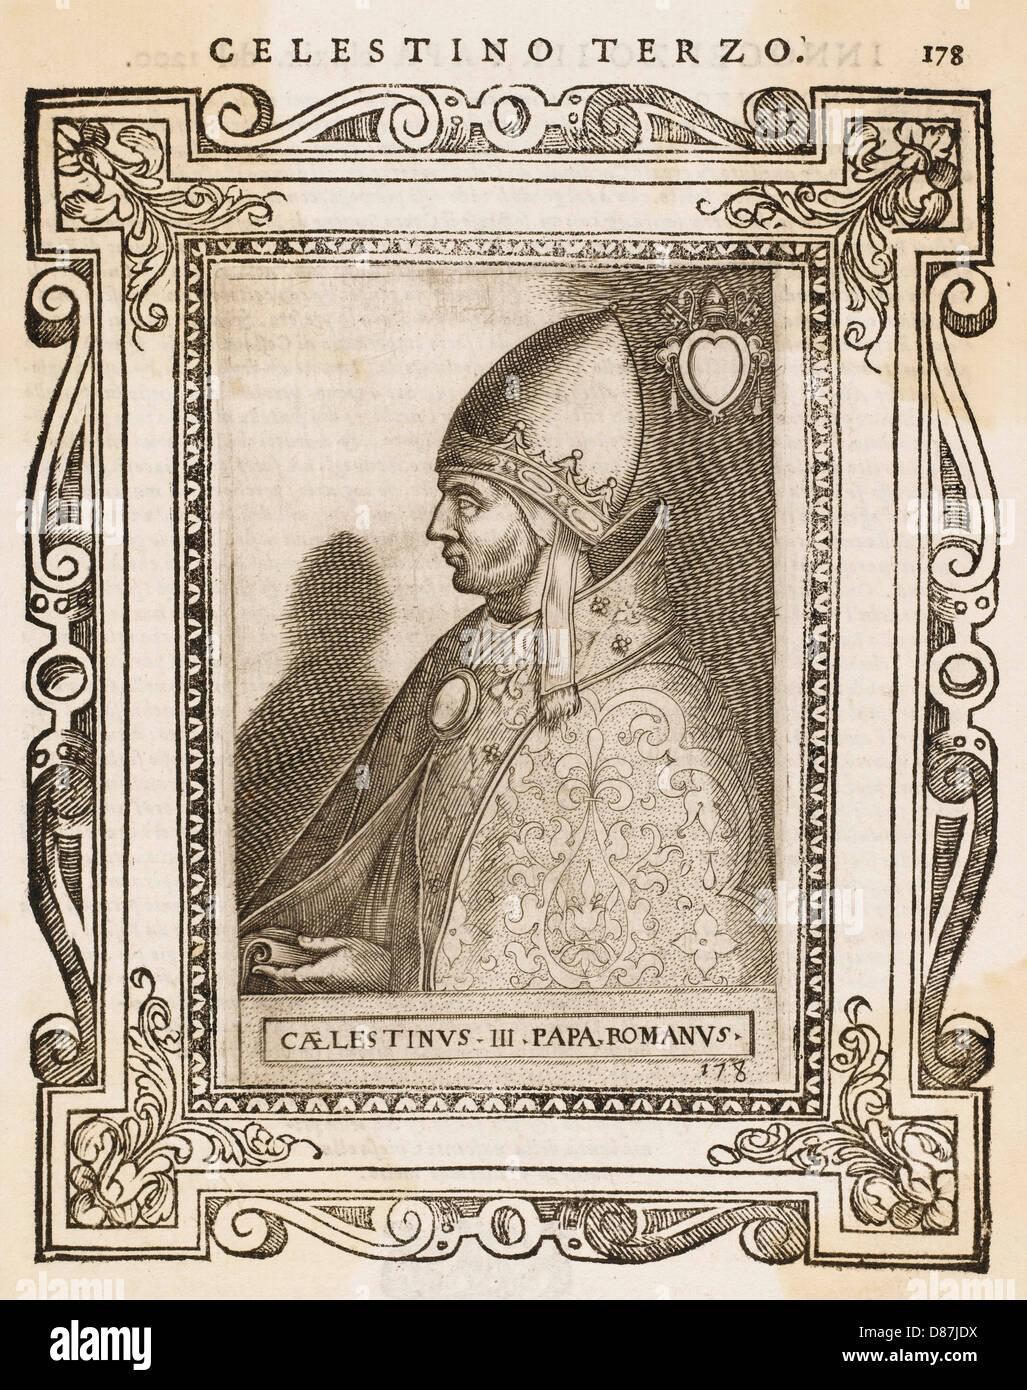 Pope Caelestinus Iii - Stock Image